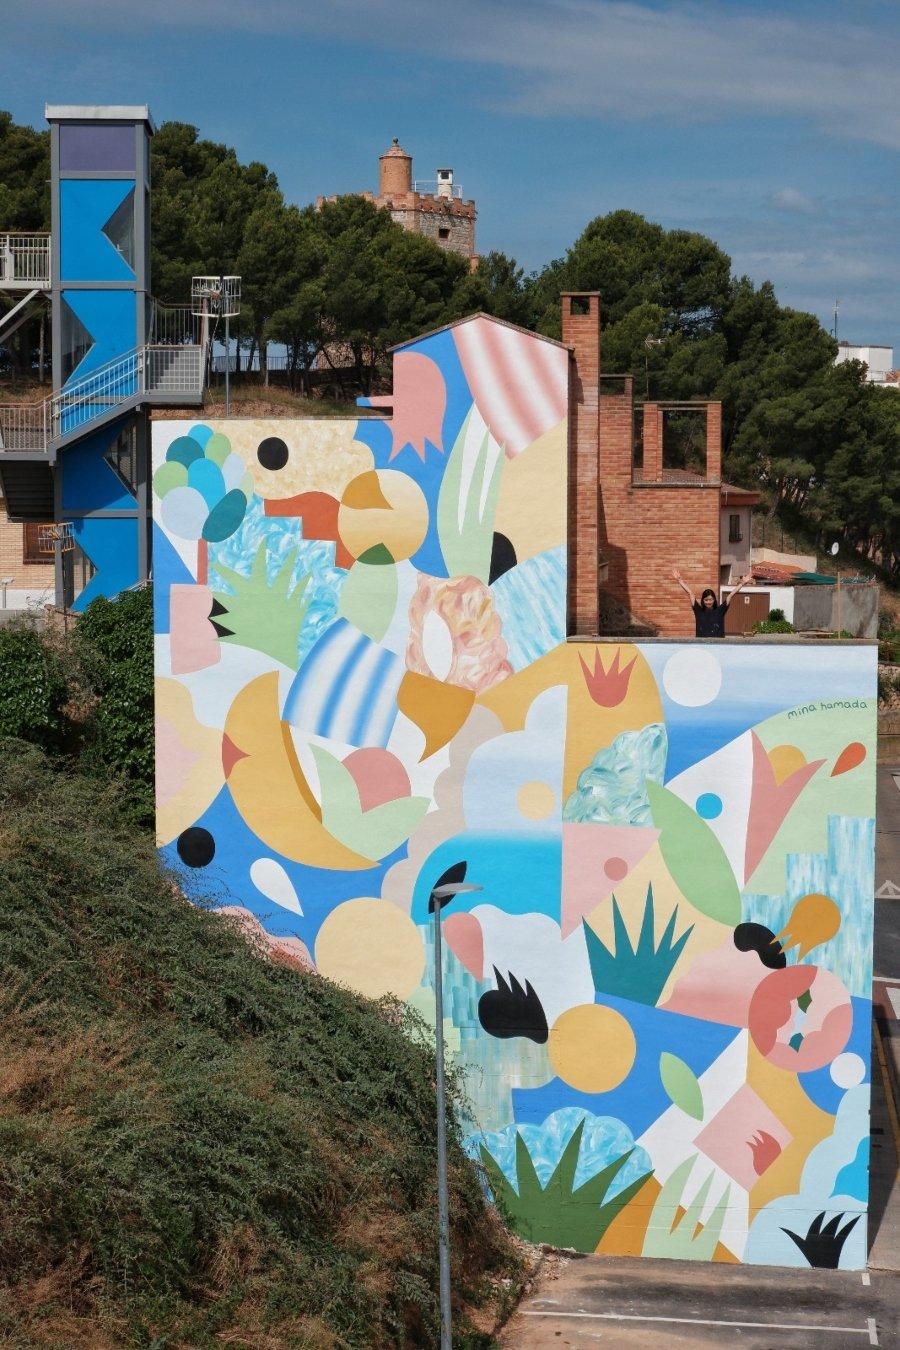 Review del mural de Mina Hamada para Avant Garde Tudela 2020